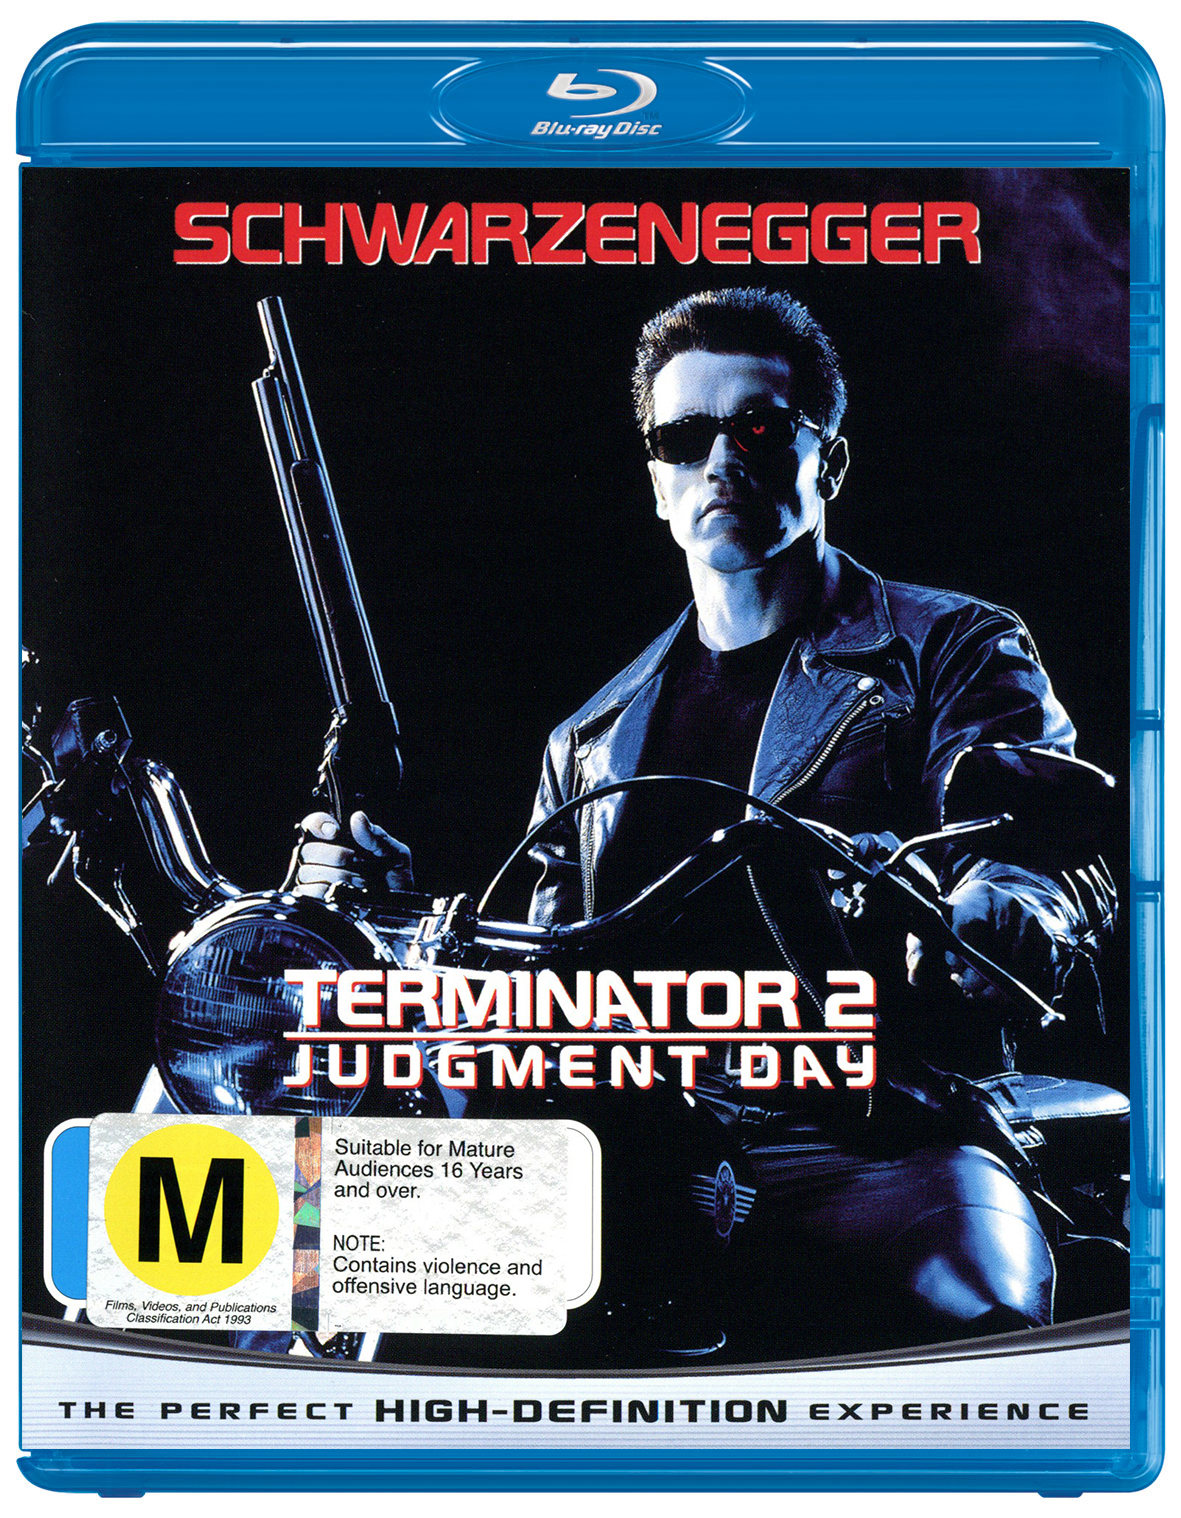 Terminator 2 - Judgement Day on Blu-ray image